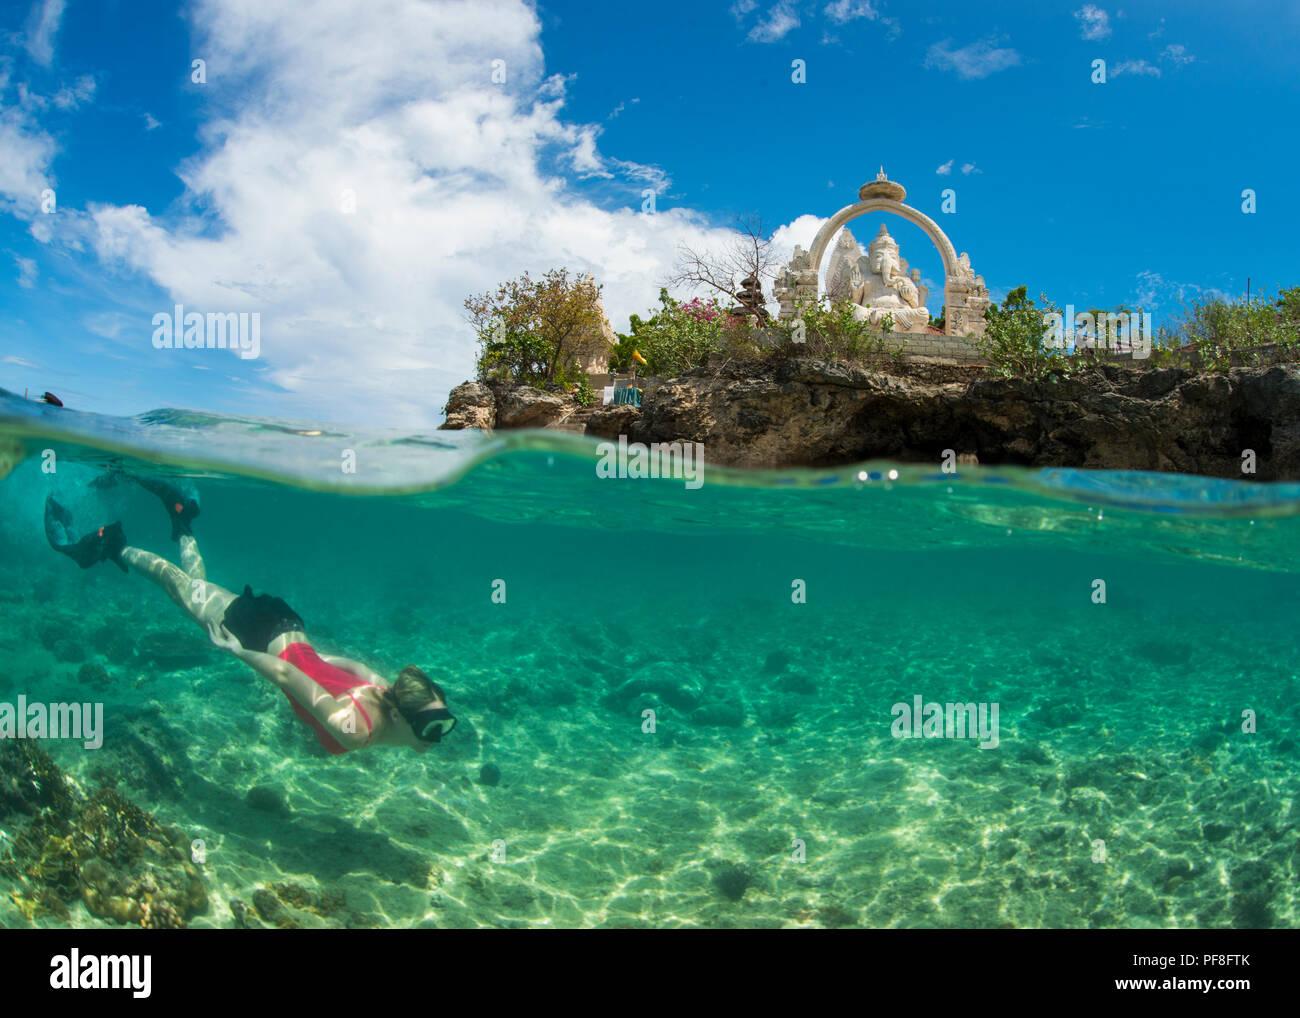 Underwater split-level photo of a female tourist snorkeller & Buddhist temple & statue of Ganesh above, at Menjangan Island, Bali, Indonesia - Stock Image